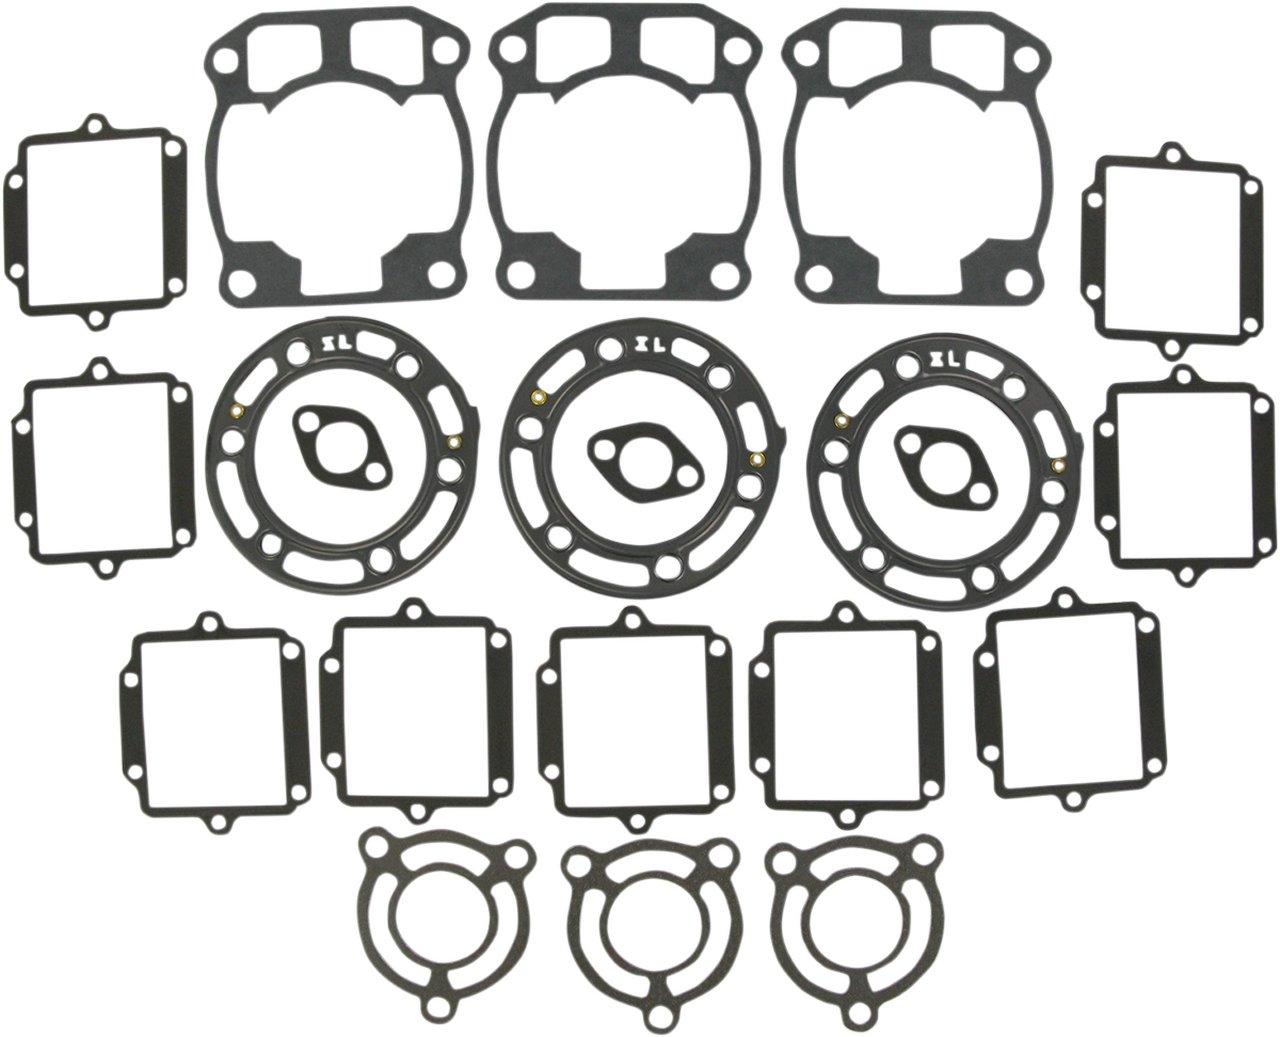 Athena Complete Gasket Kit for Suzuki RM250 1991-1993